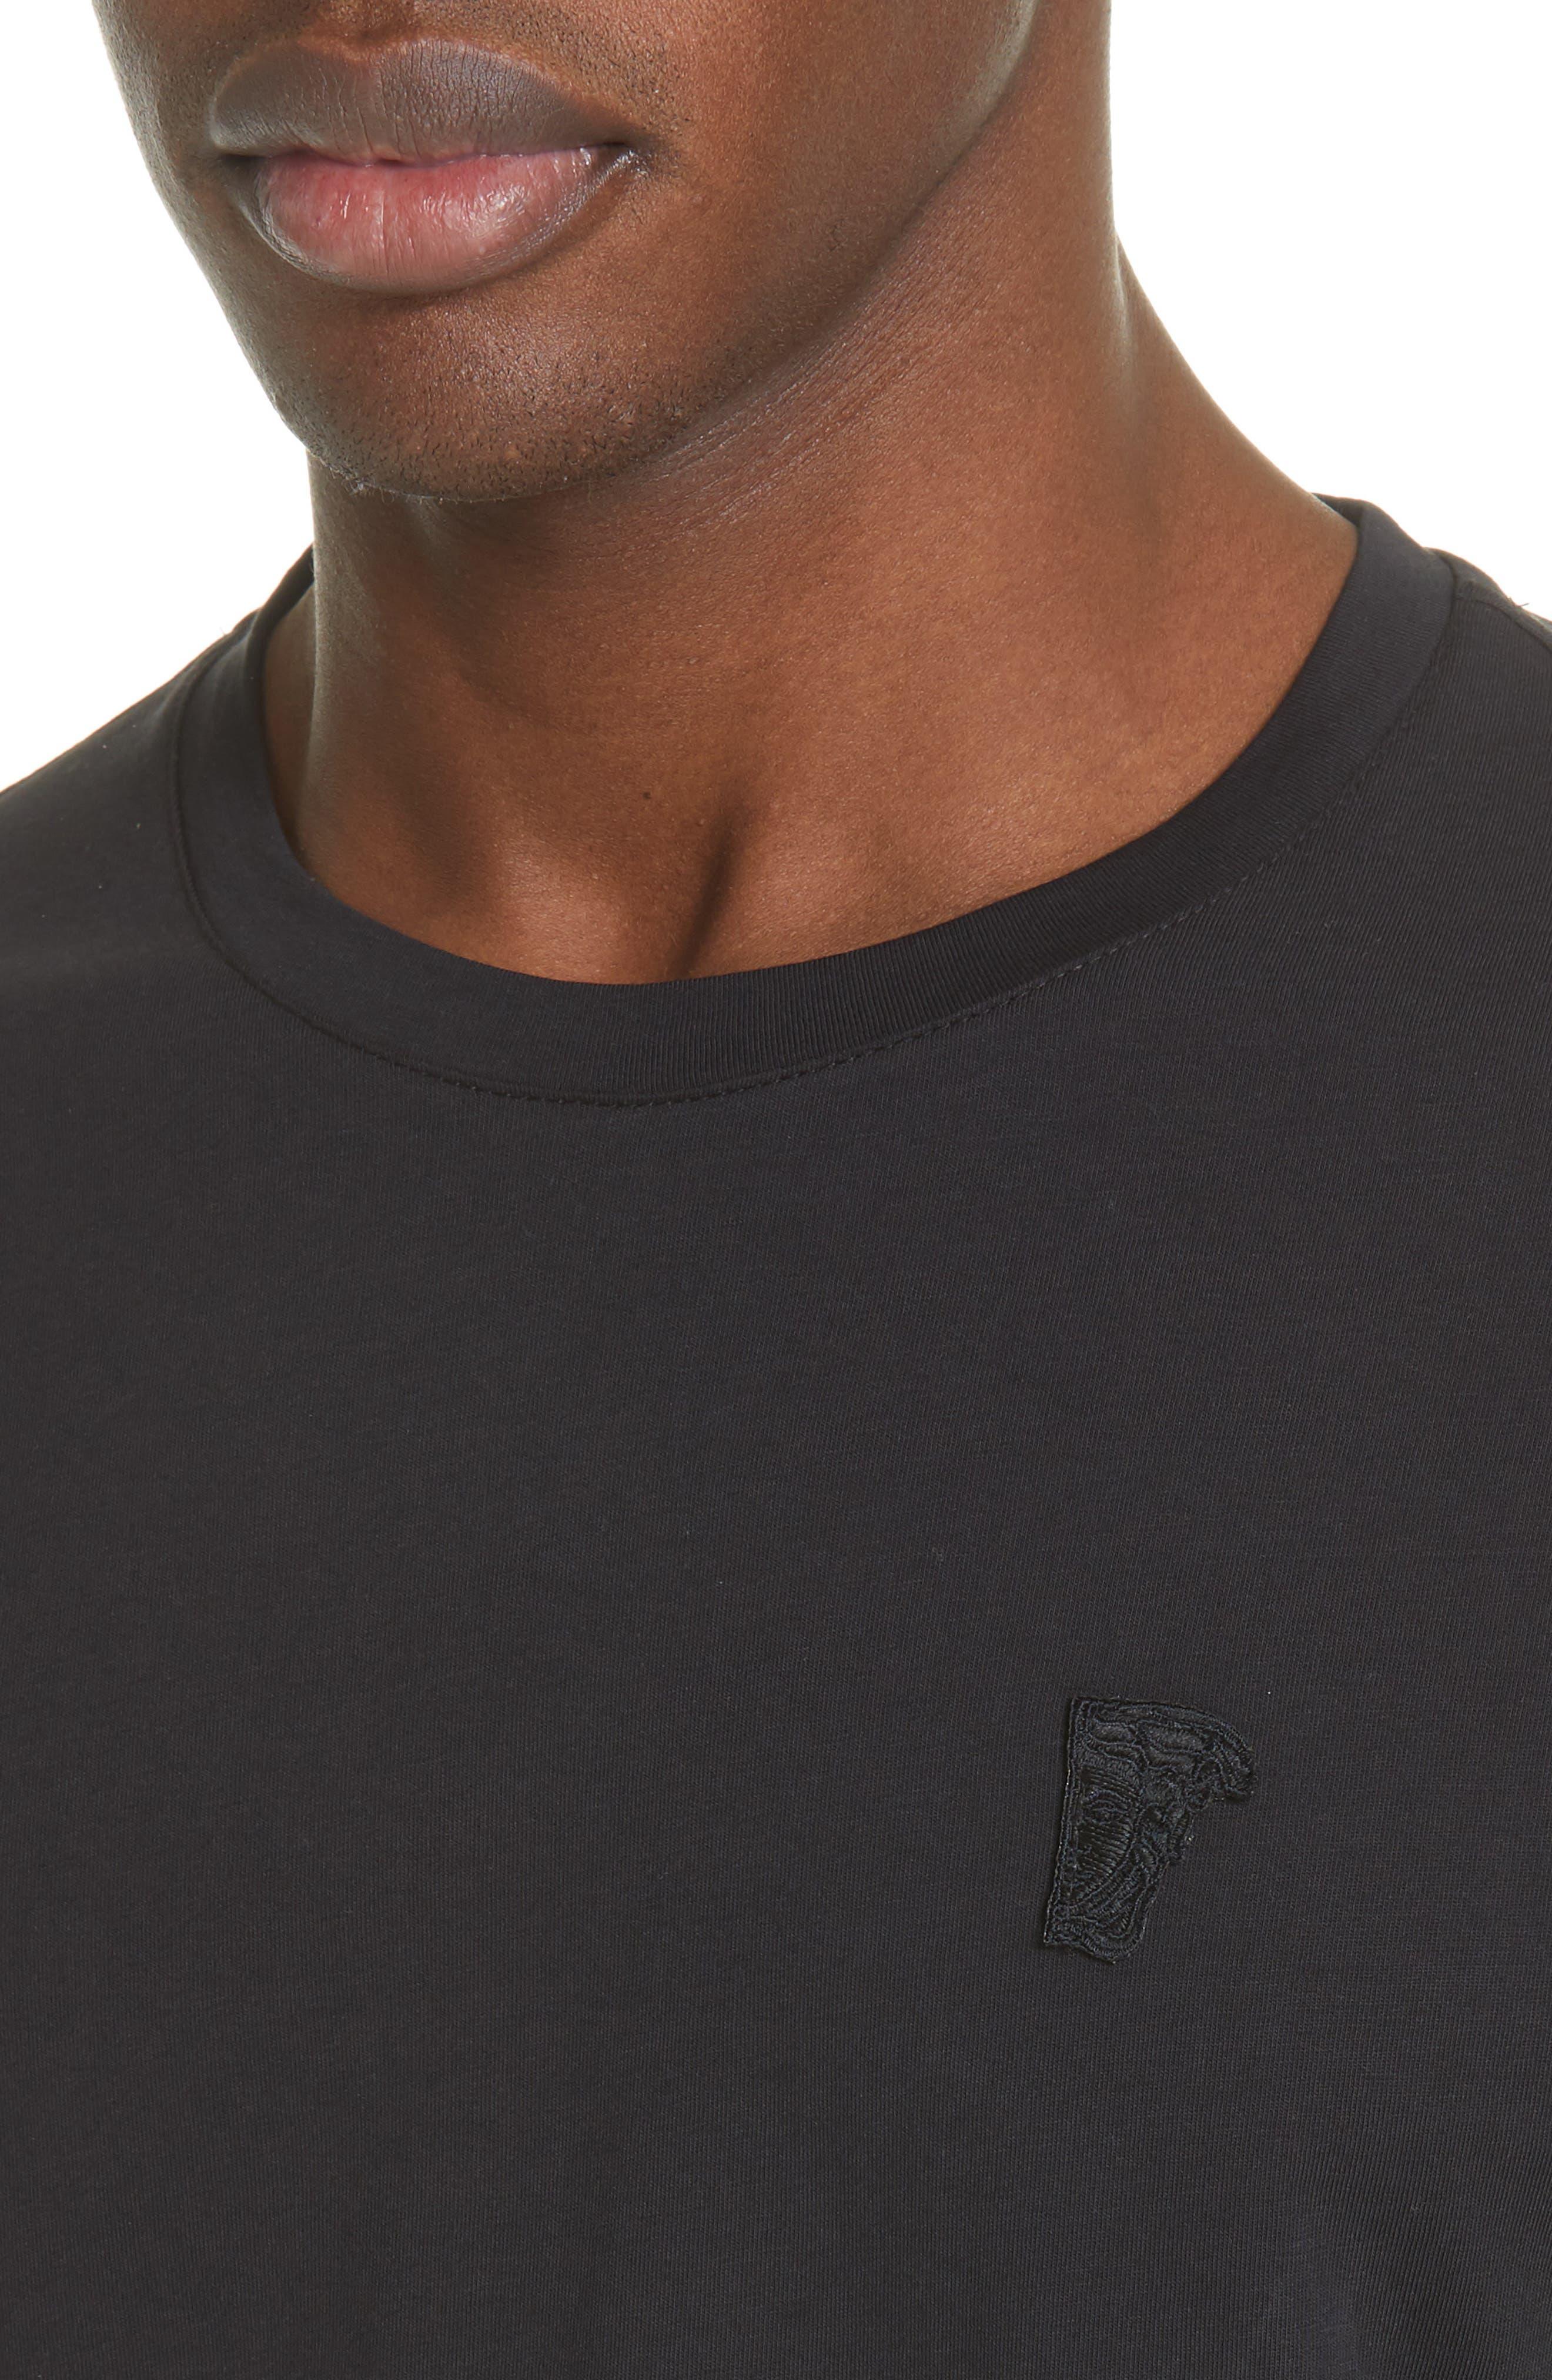 VERSACE COLLECTION, Medusa Long Sleeve T-Shirt, Alternate thumbnail 4, color, 001